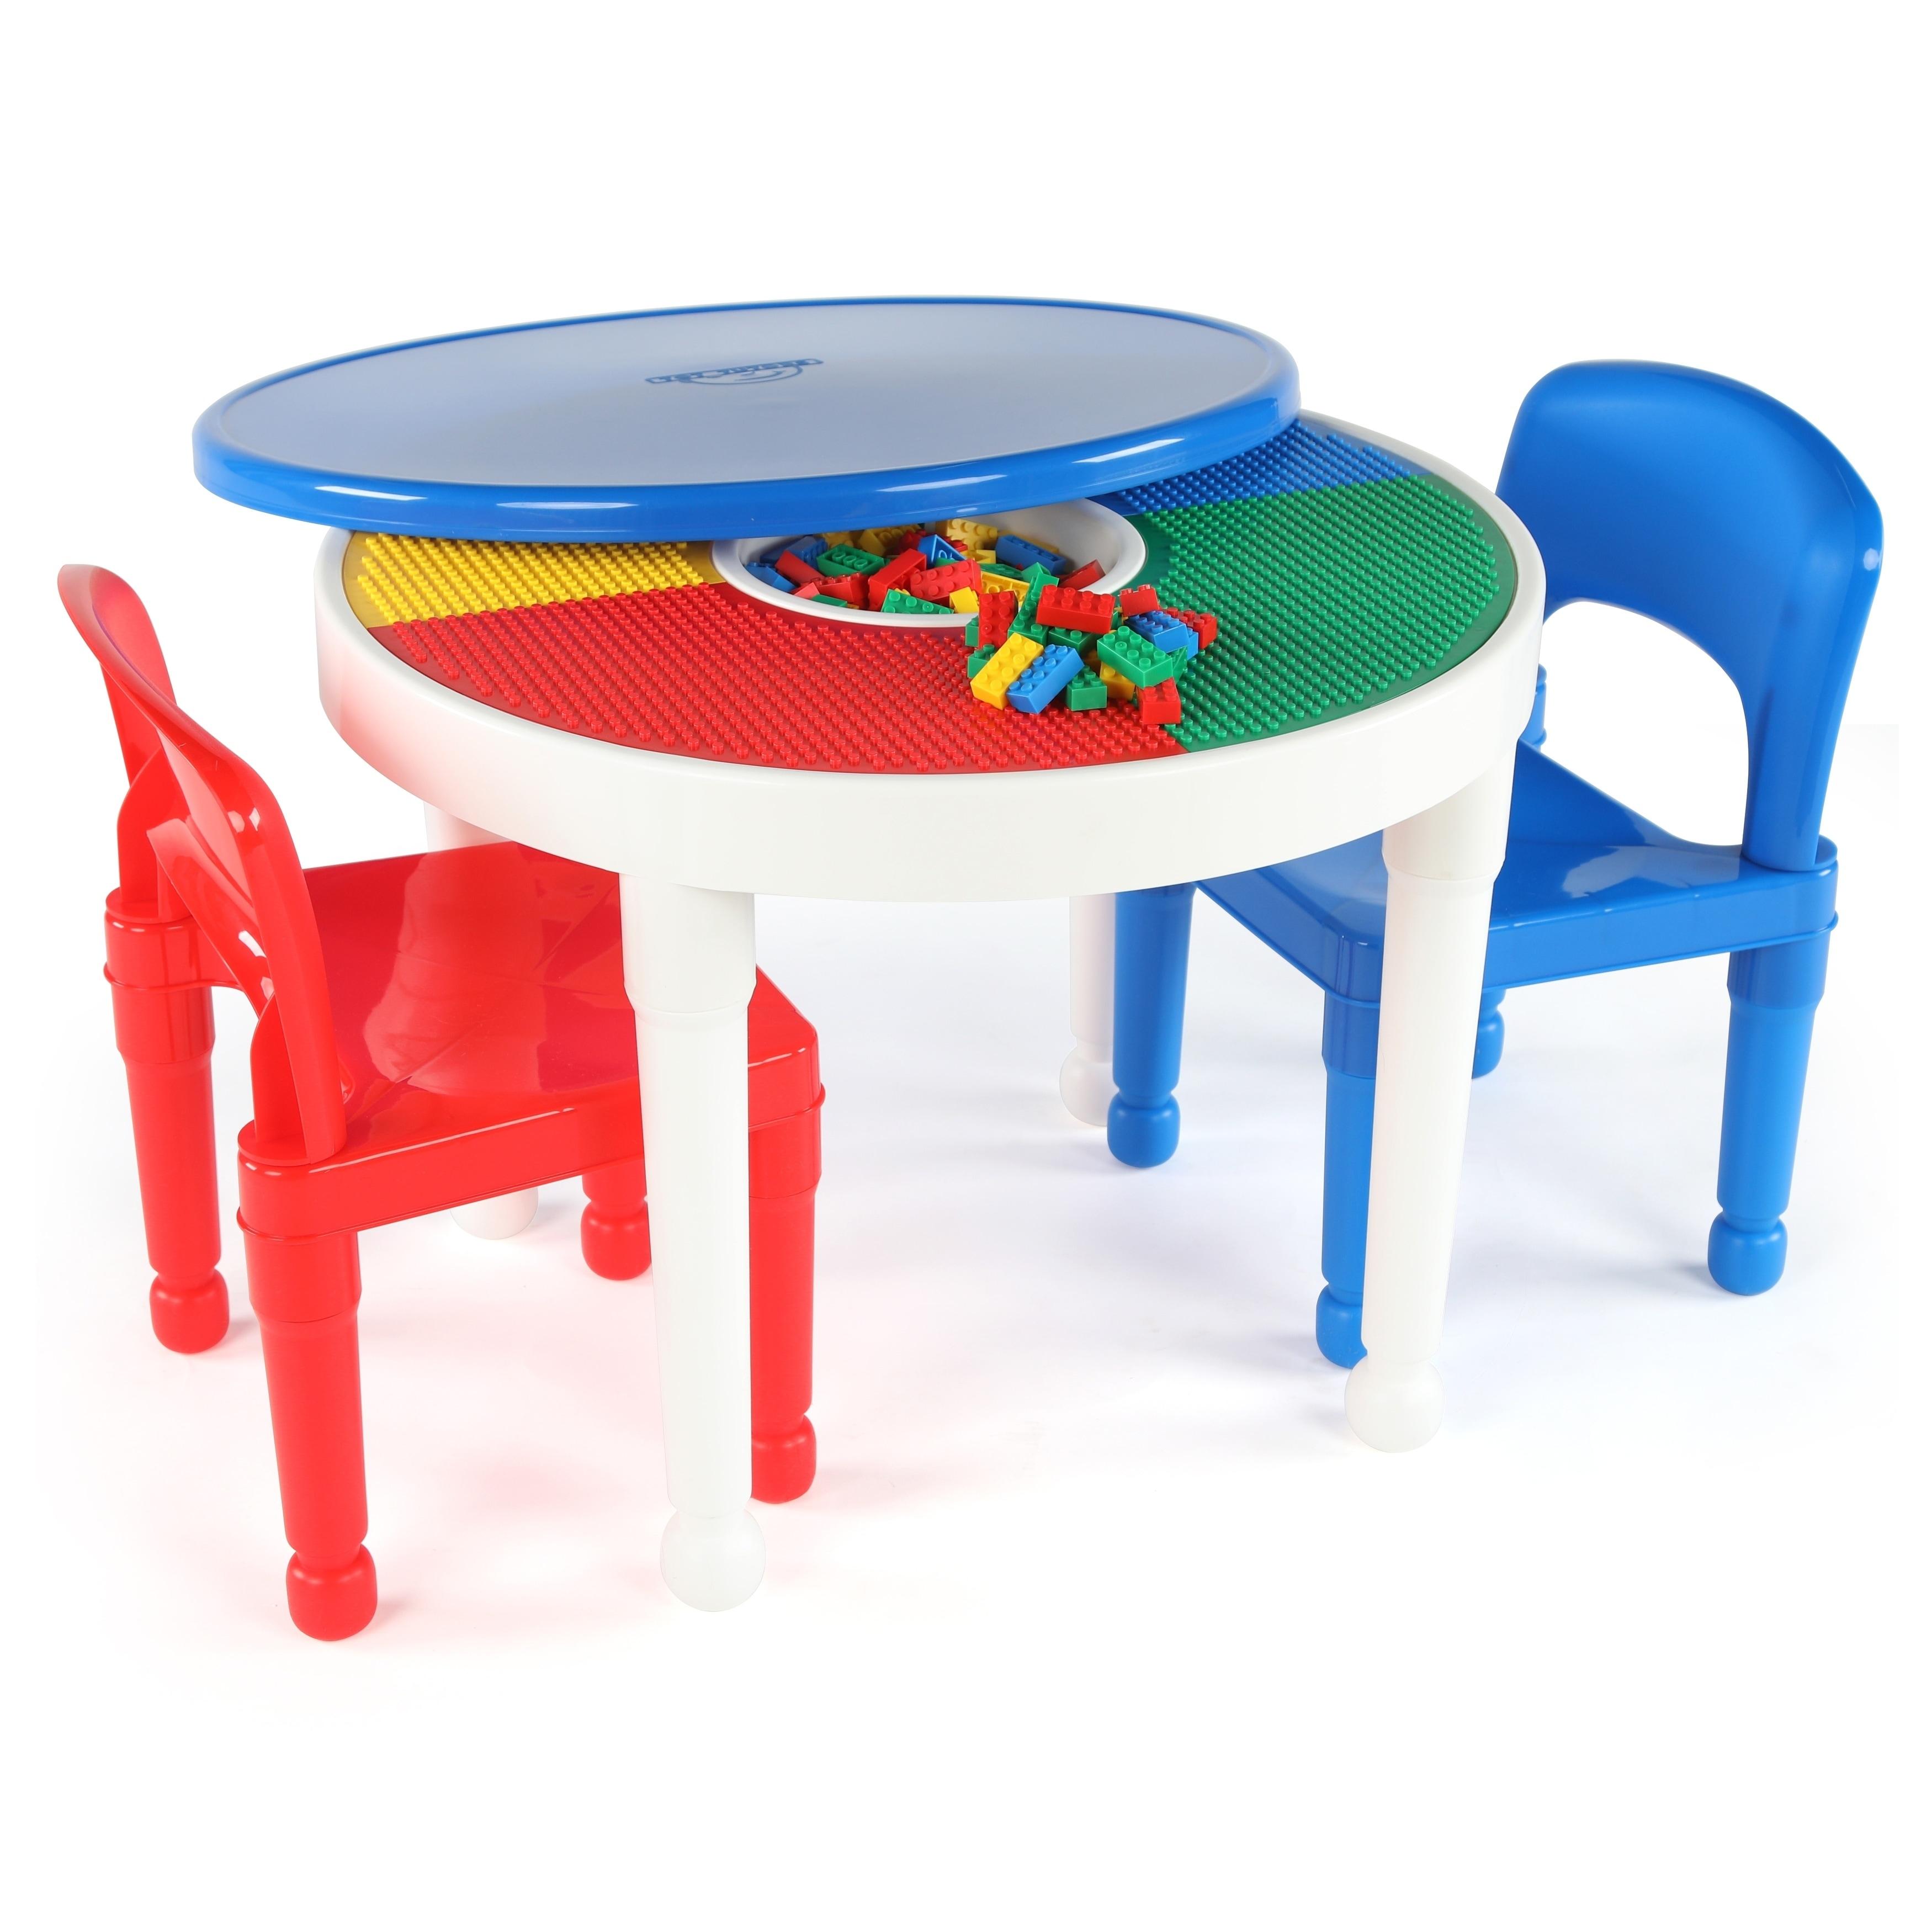 Lego Tot Tutors Kids 2-in-1 Plastic Activity Table & 2 Ch...